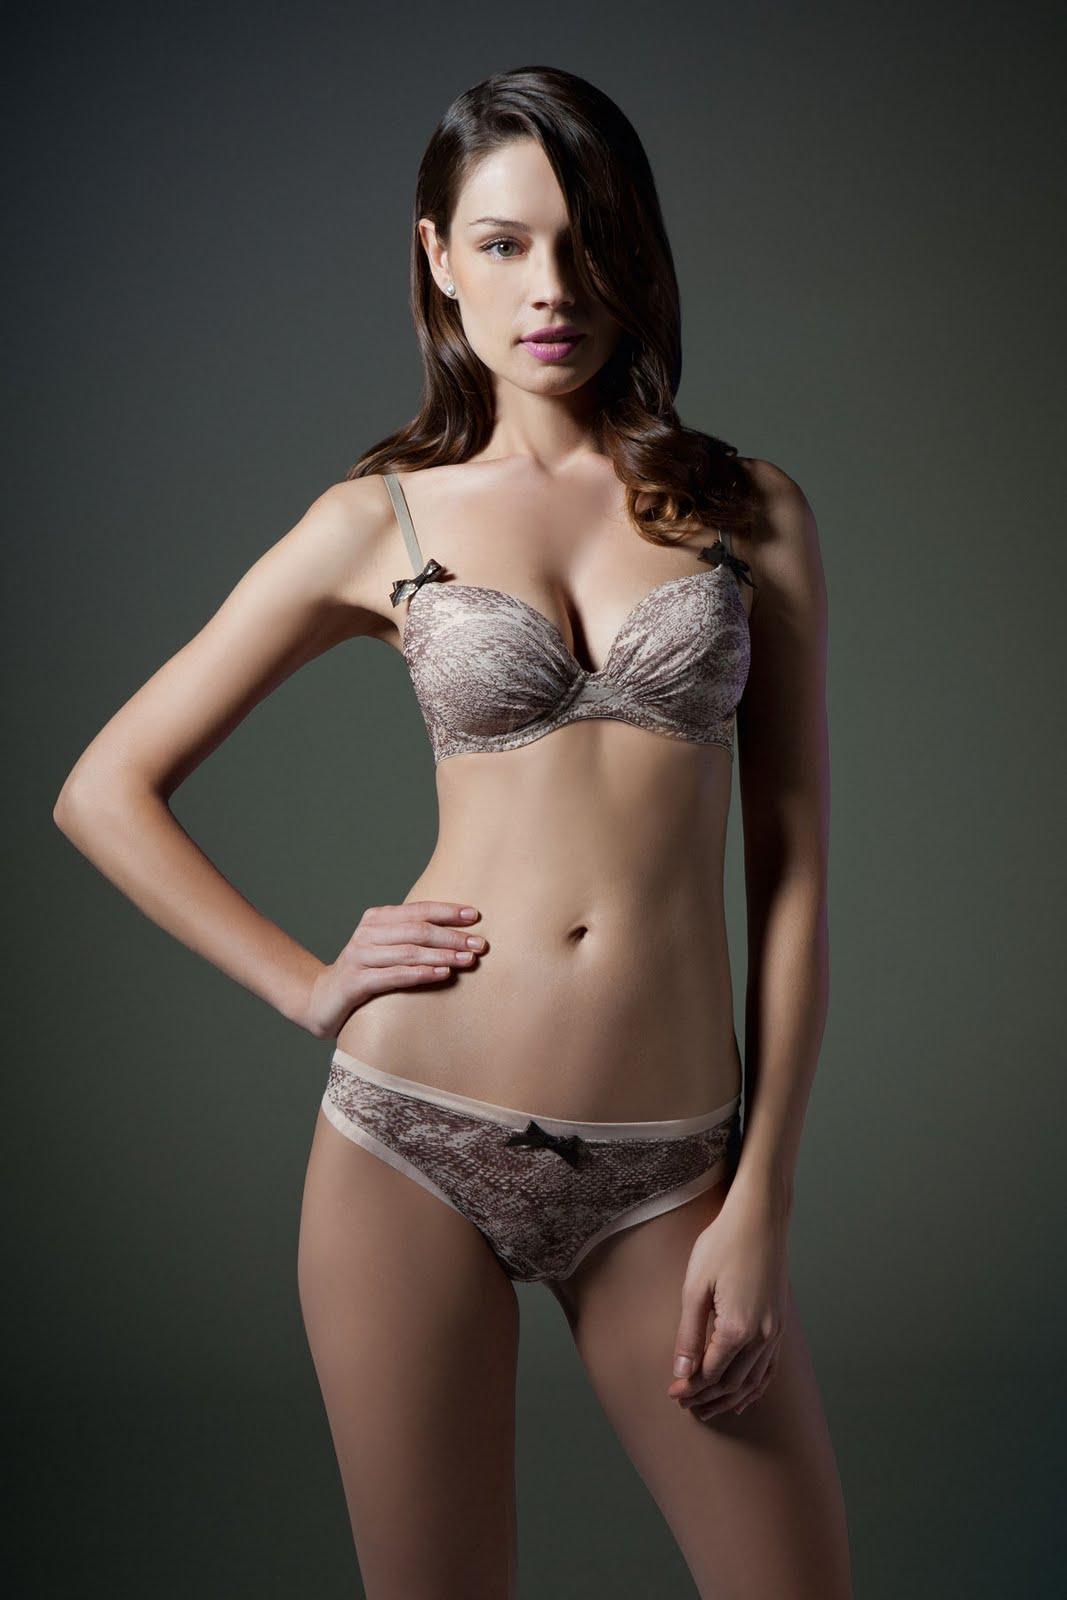 Hot Patricia Beck nudes (26 photo), Sideboobs